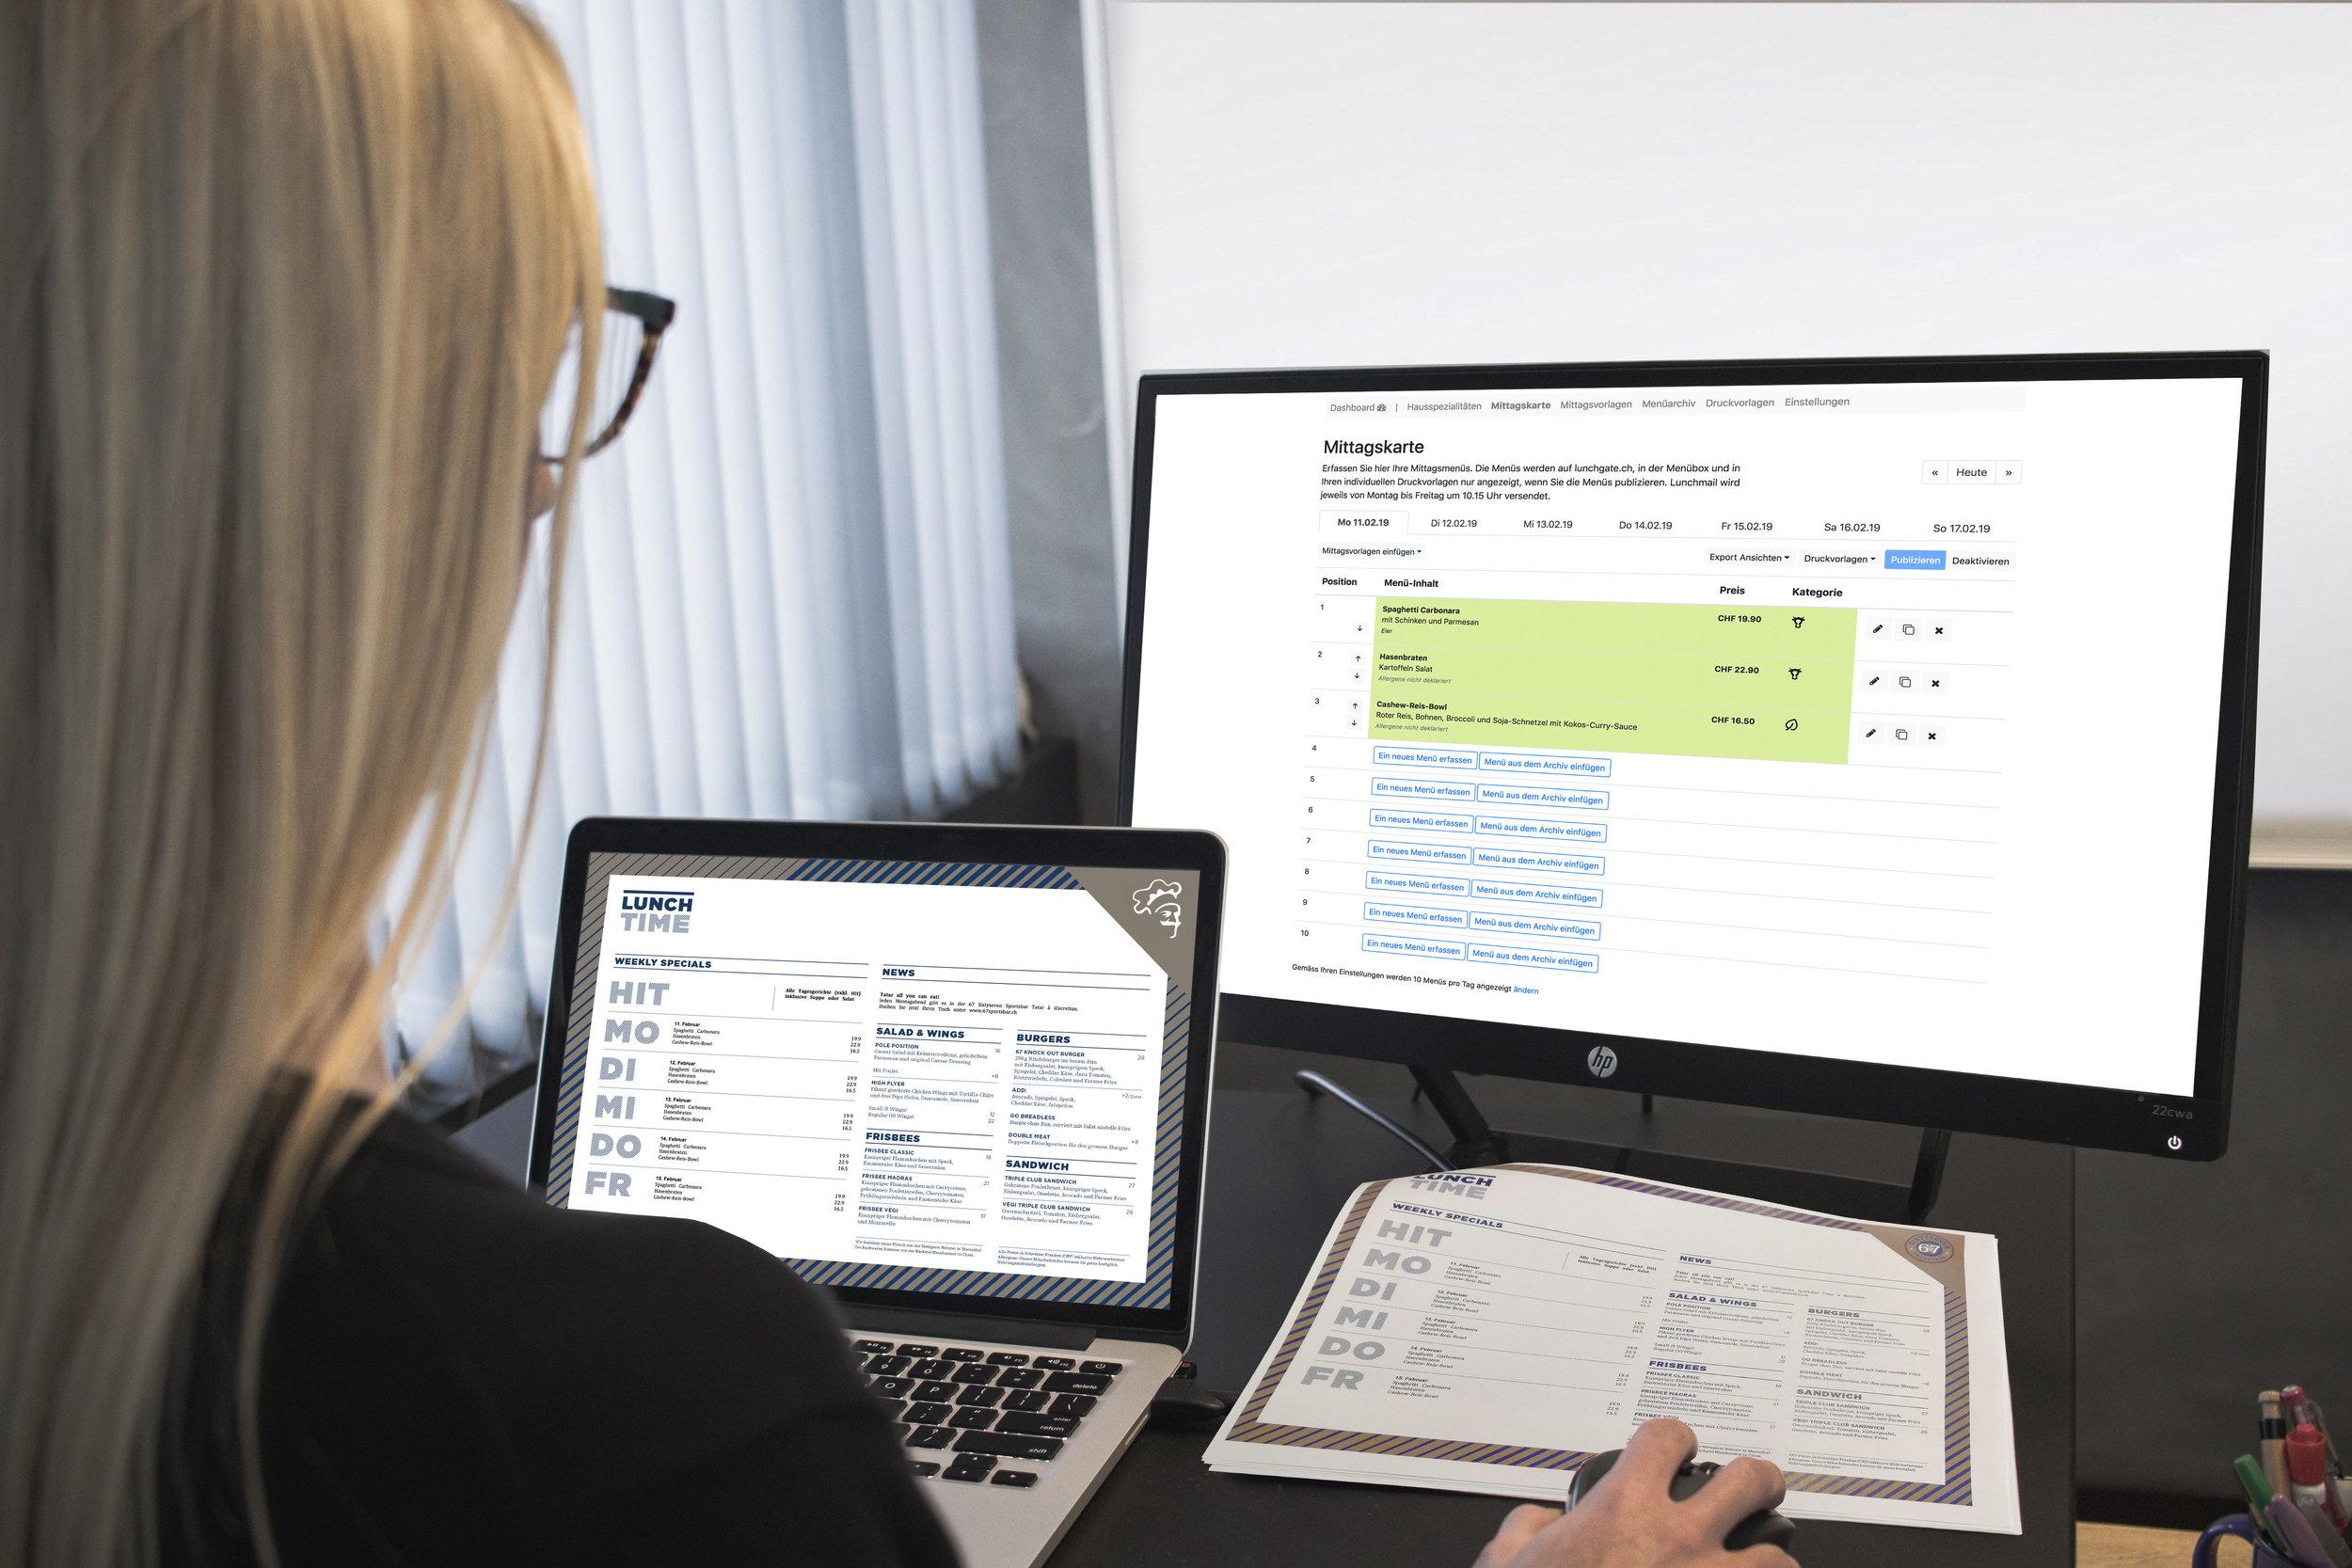 Mittagsmenü-Laptop-Screen.jpg